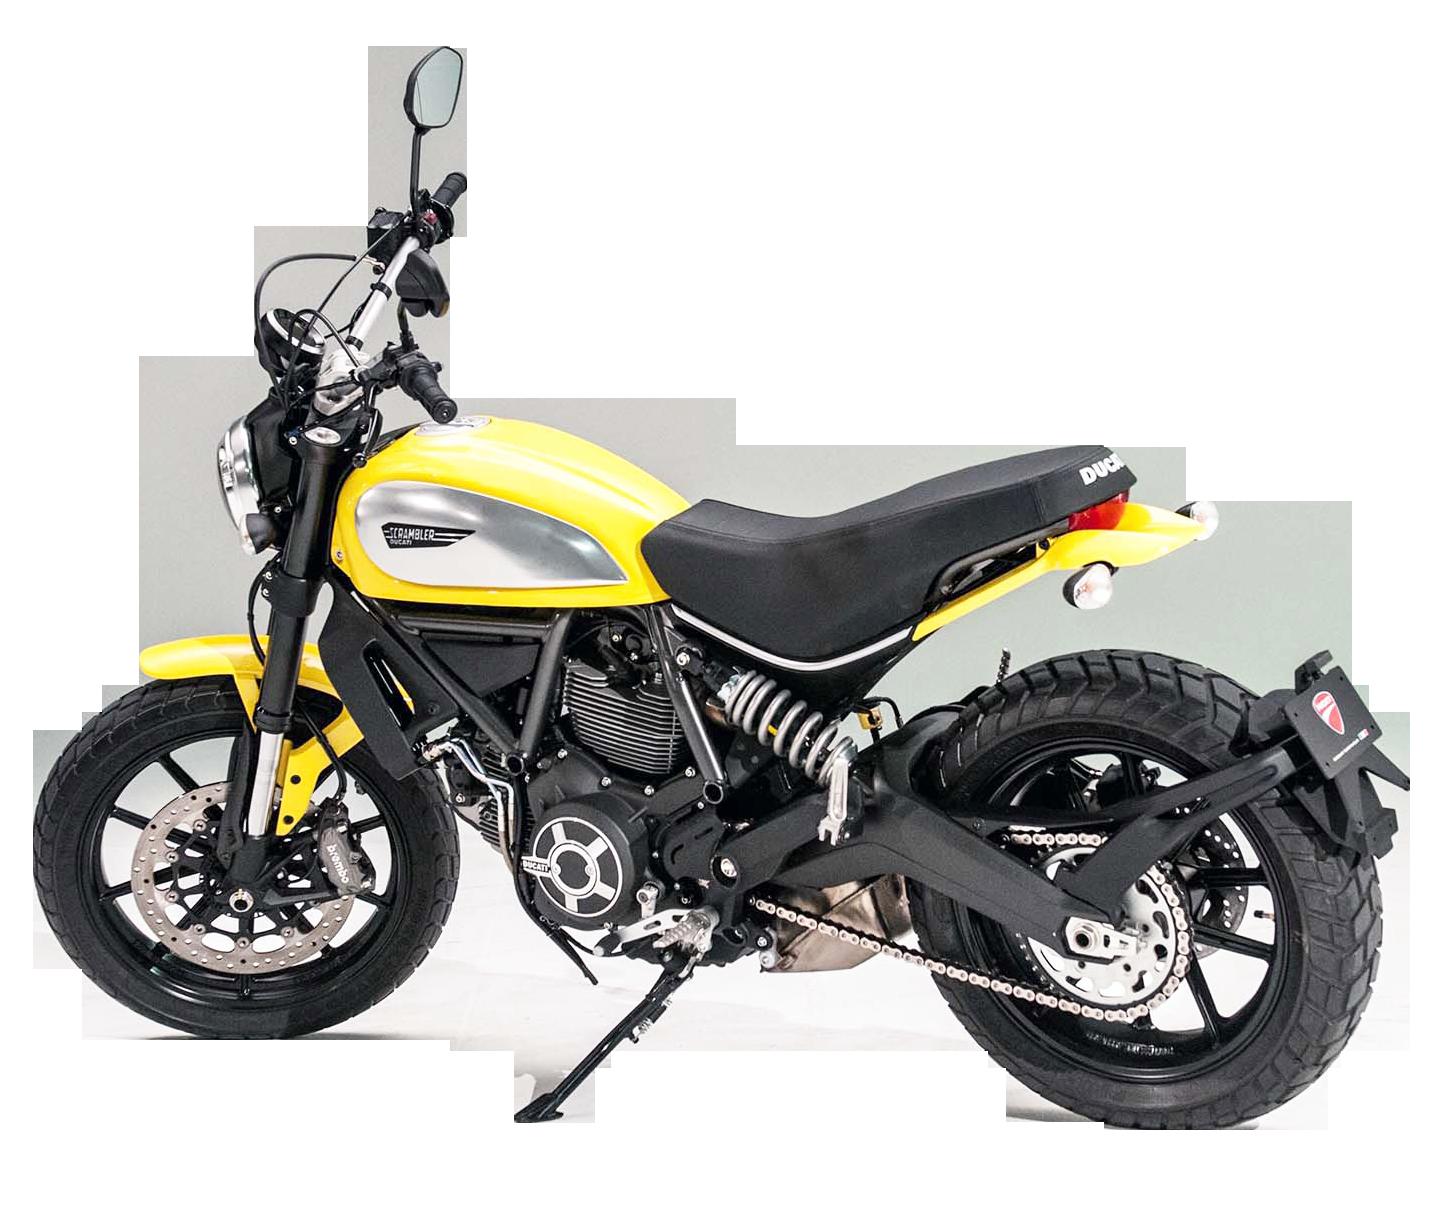 Ducati scrambler bike png. Motorcycle clipart yellow motorcycle